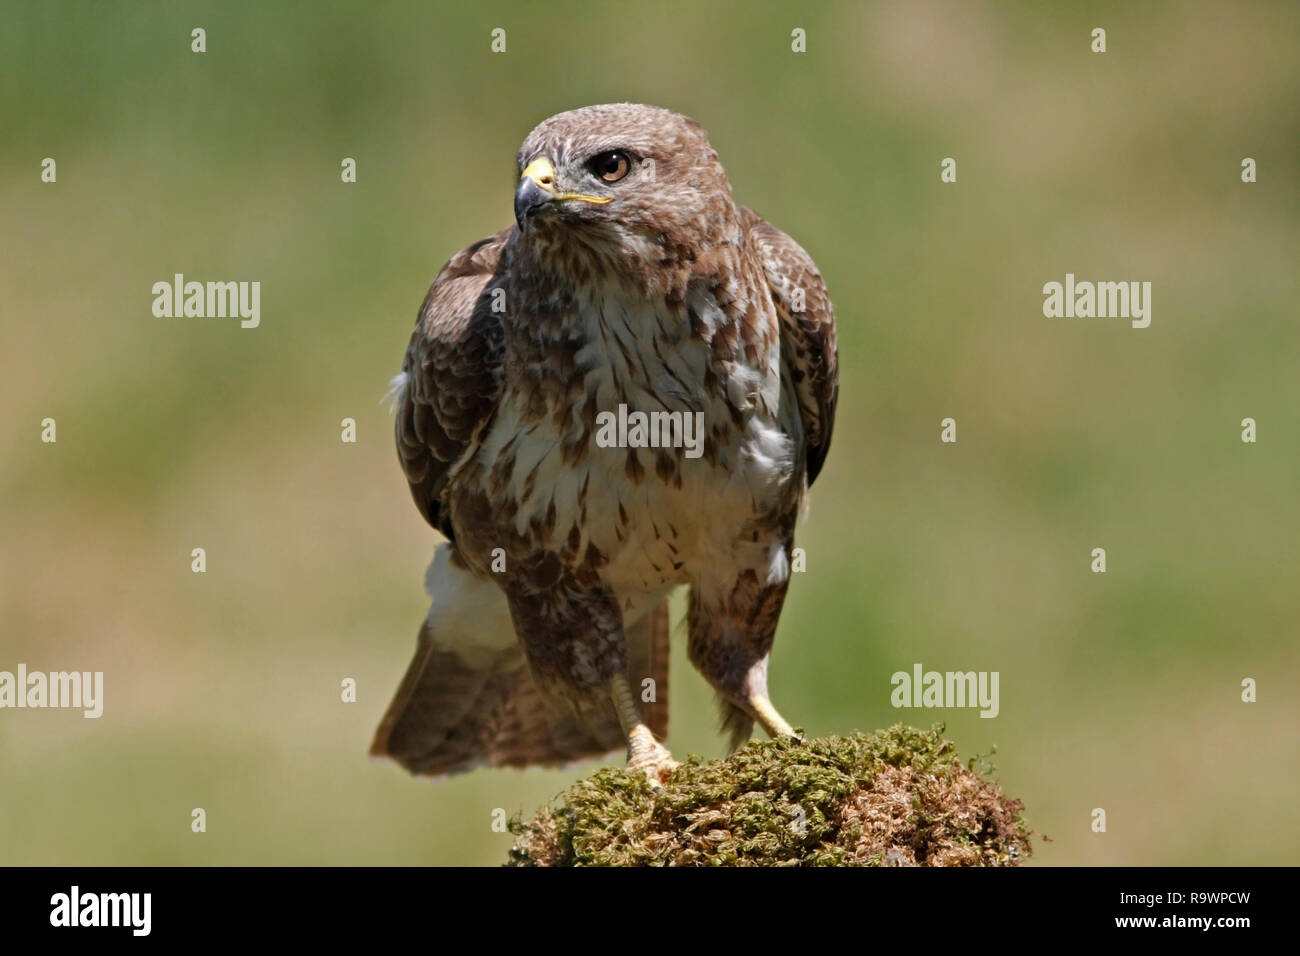 common-buzzard-buteo-buteo-on-a-stump-uk-R9WPCW.jpg